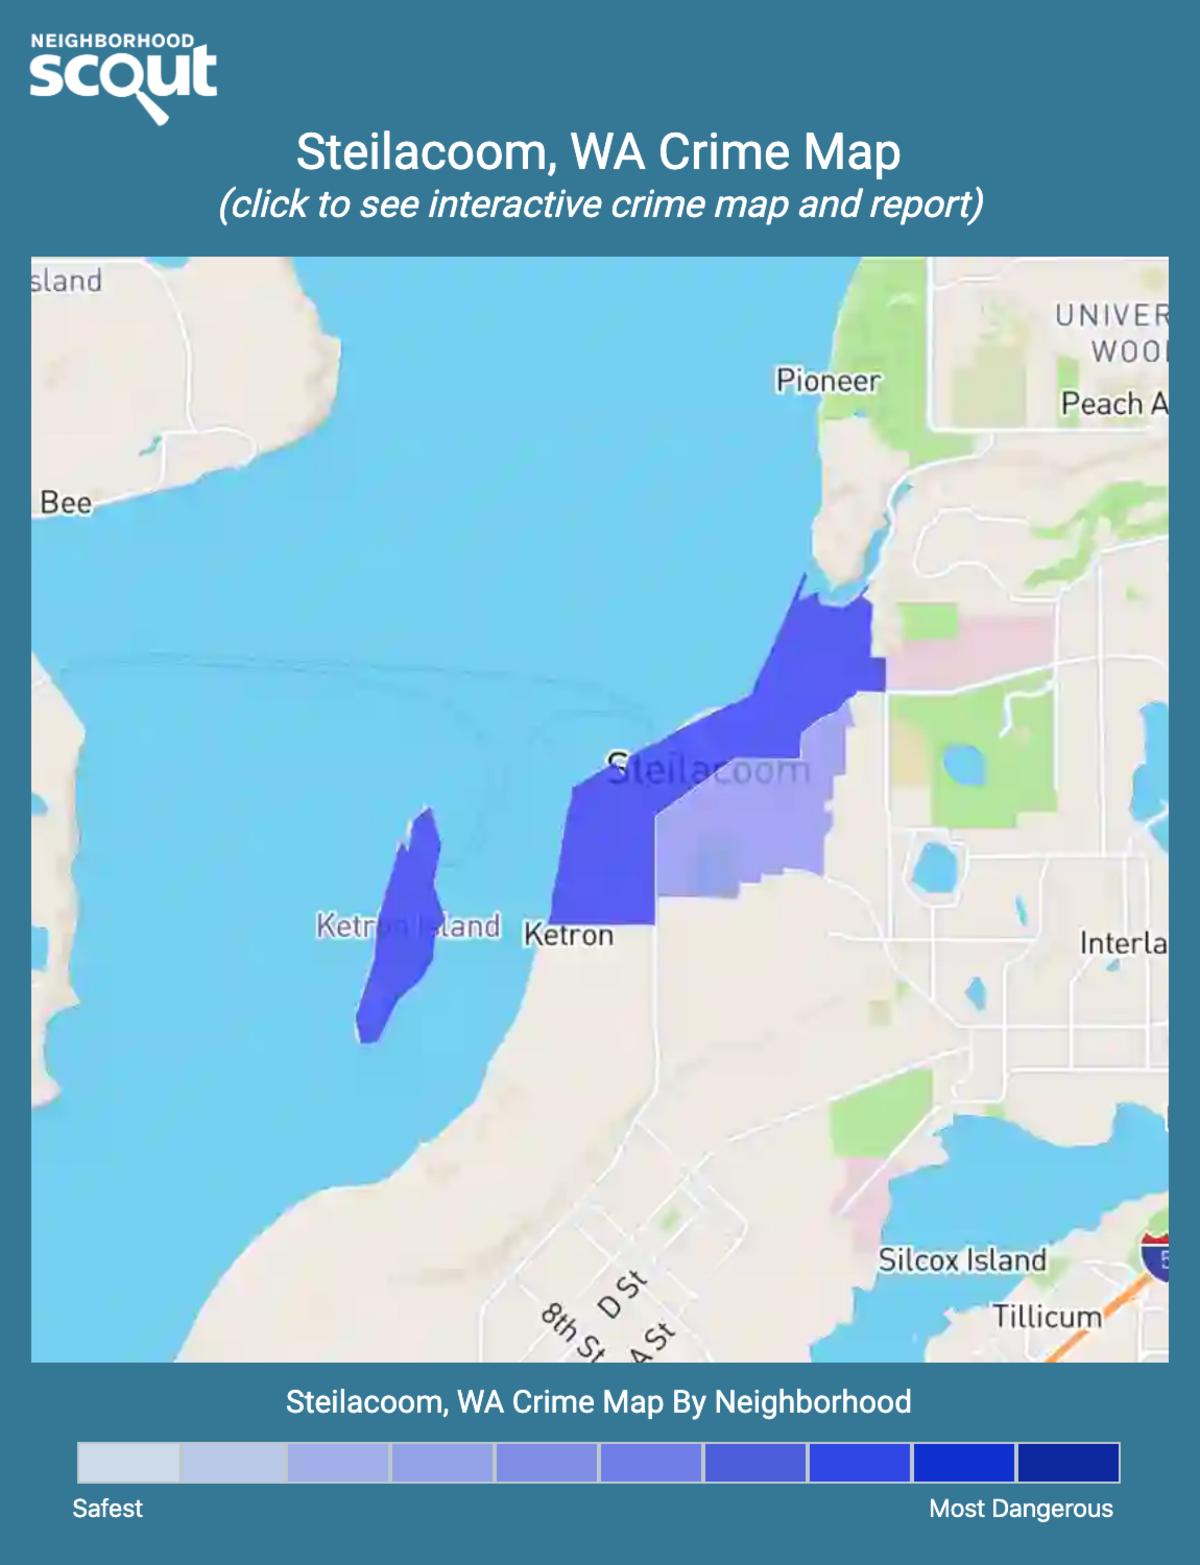 Steilacoom, Washington crime map